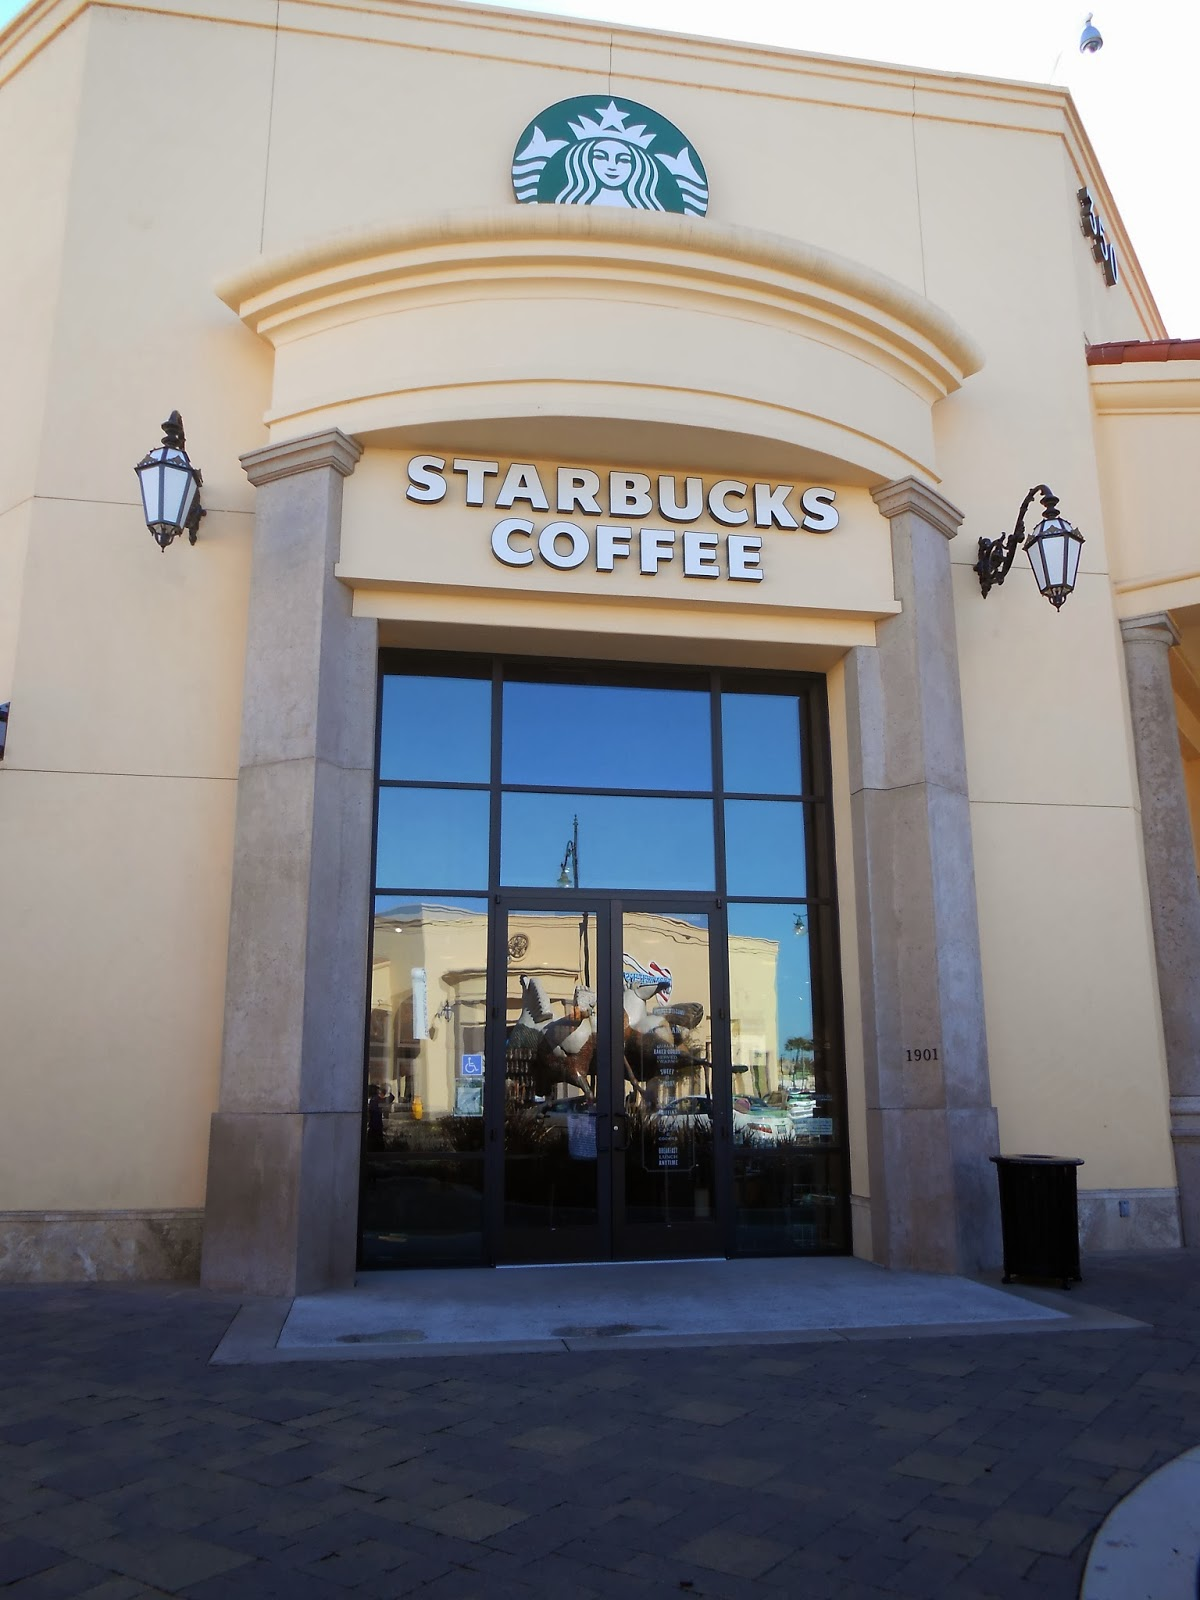 Haydens Business Blog Starbucks Coffee in the Palladio at